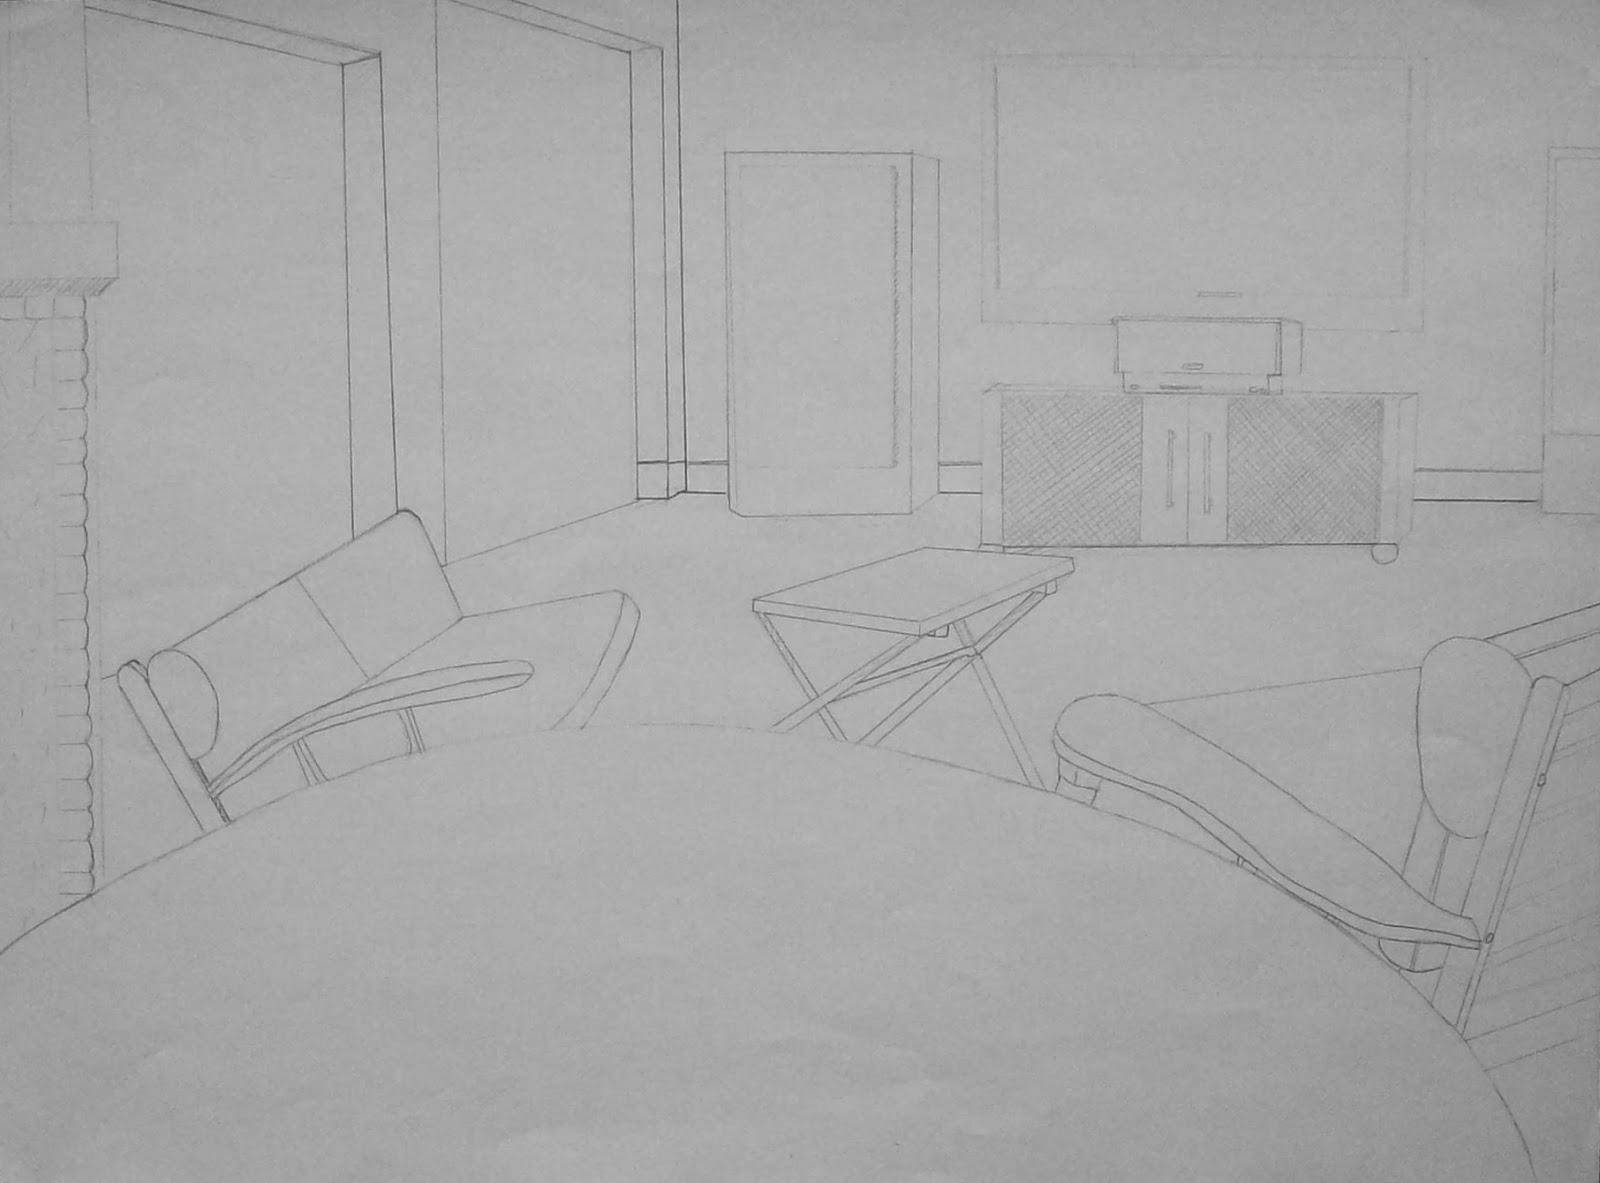 Amanda morley 39 s drawings perspective interior and exterior for Exterior 1 point perspective